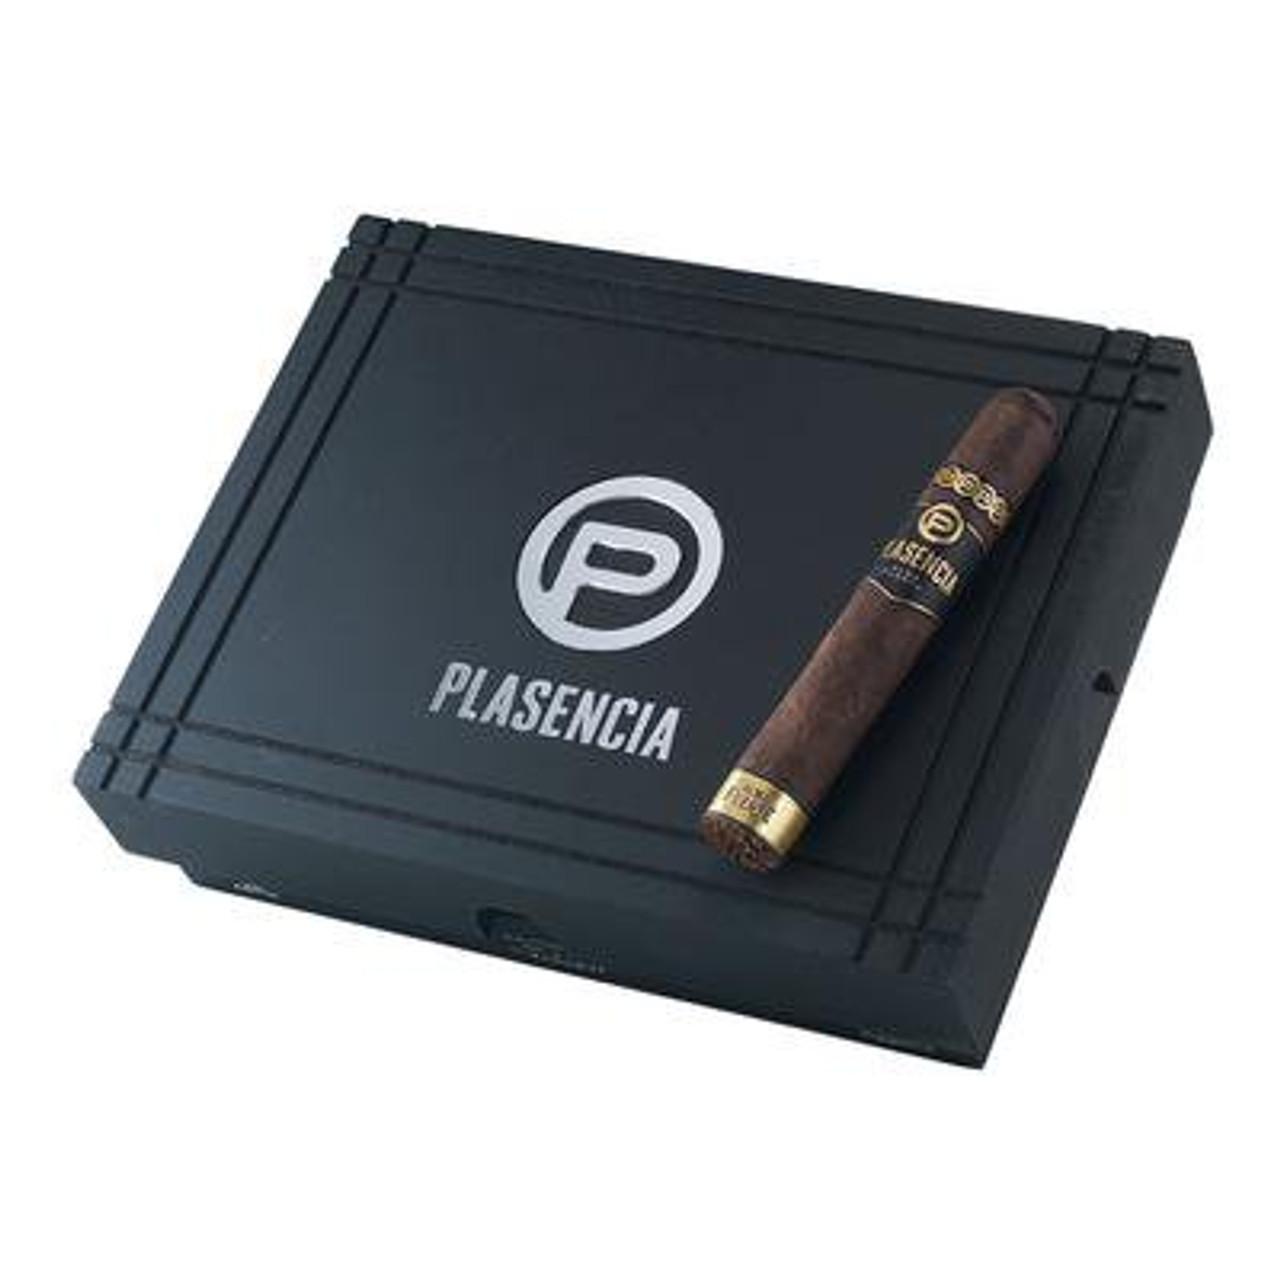 Plasencia Alma Fuerte Salomon Cigars - 7 x 58 (Box of 10)